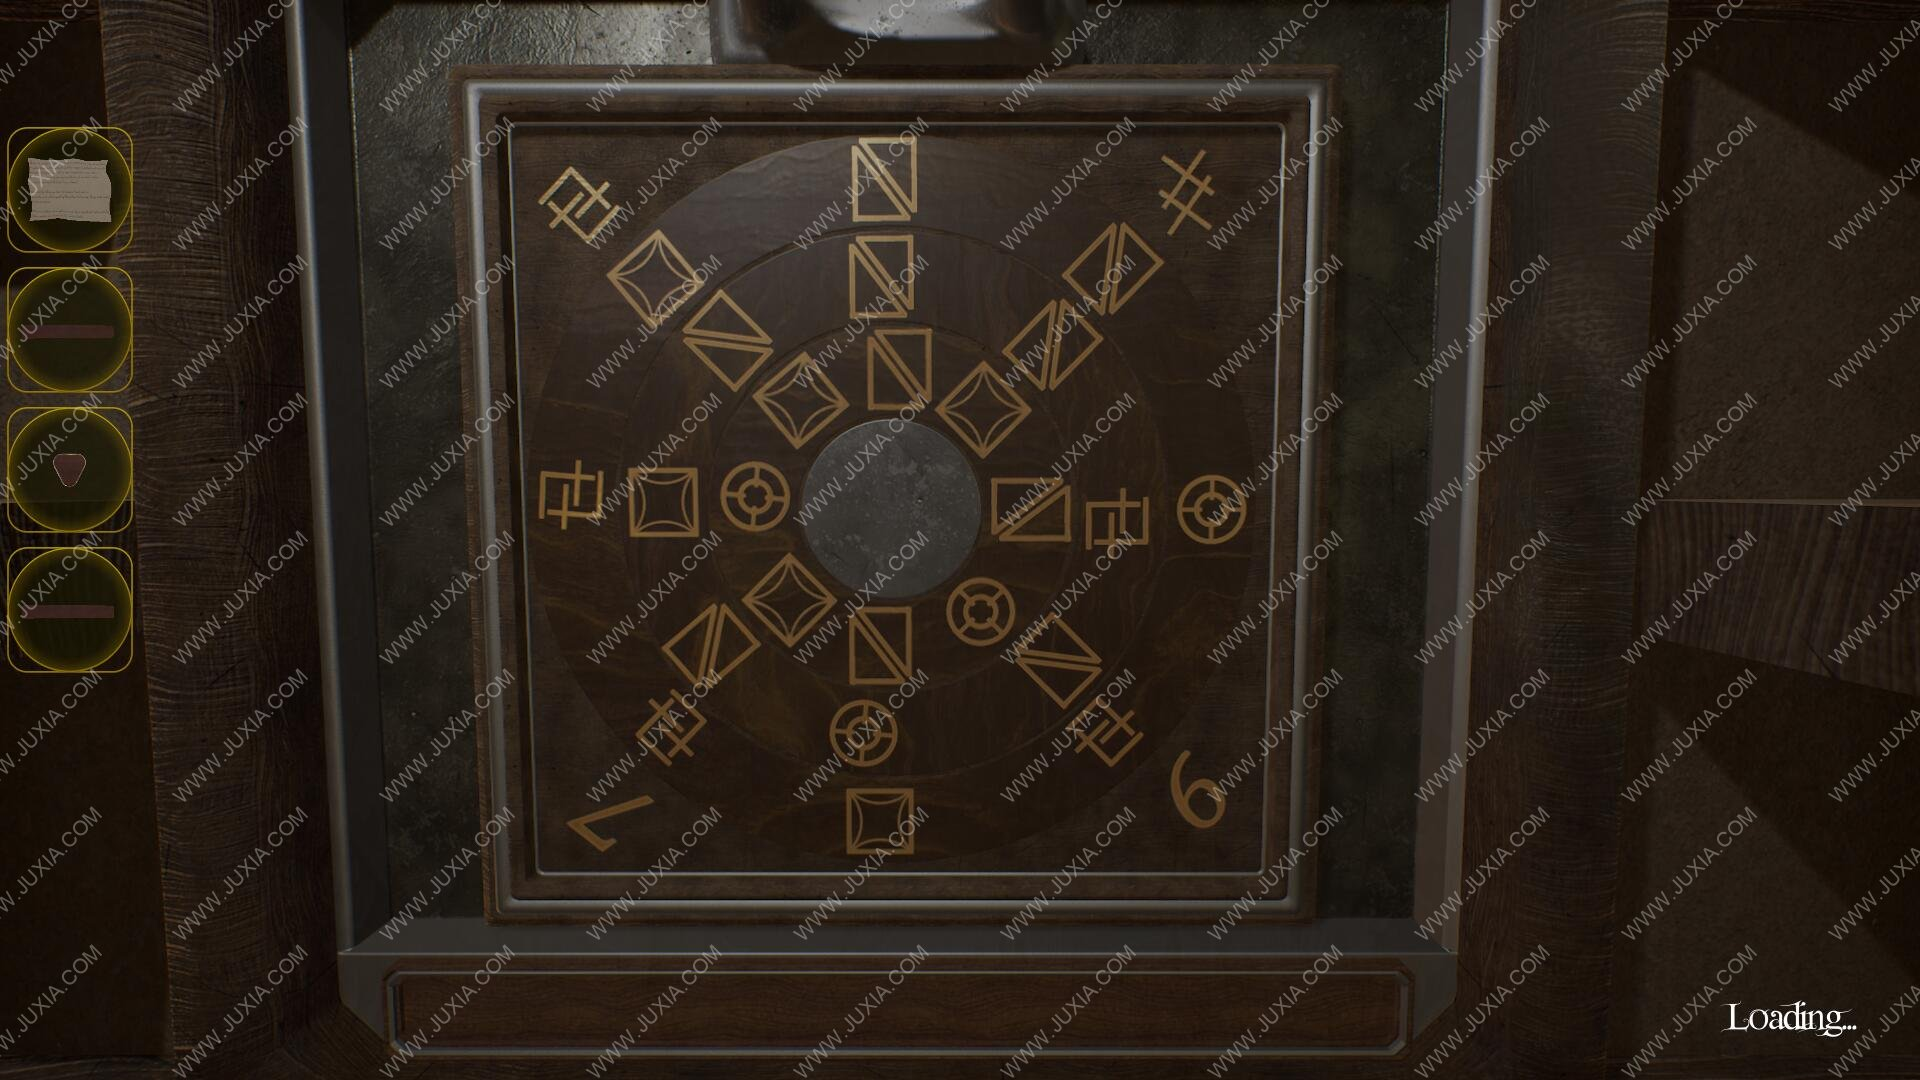 GordianRooms地下室攻略下 Acuriousheritage木棍怎么找